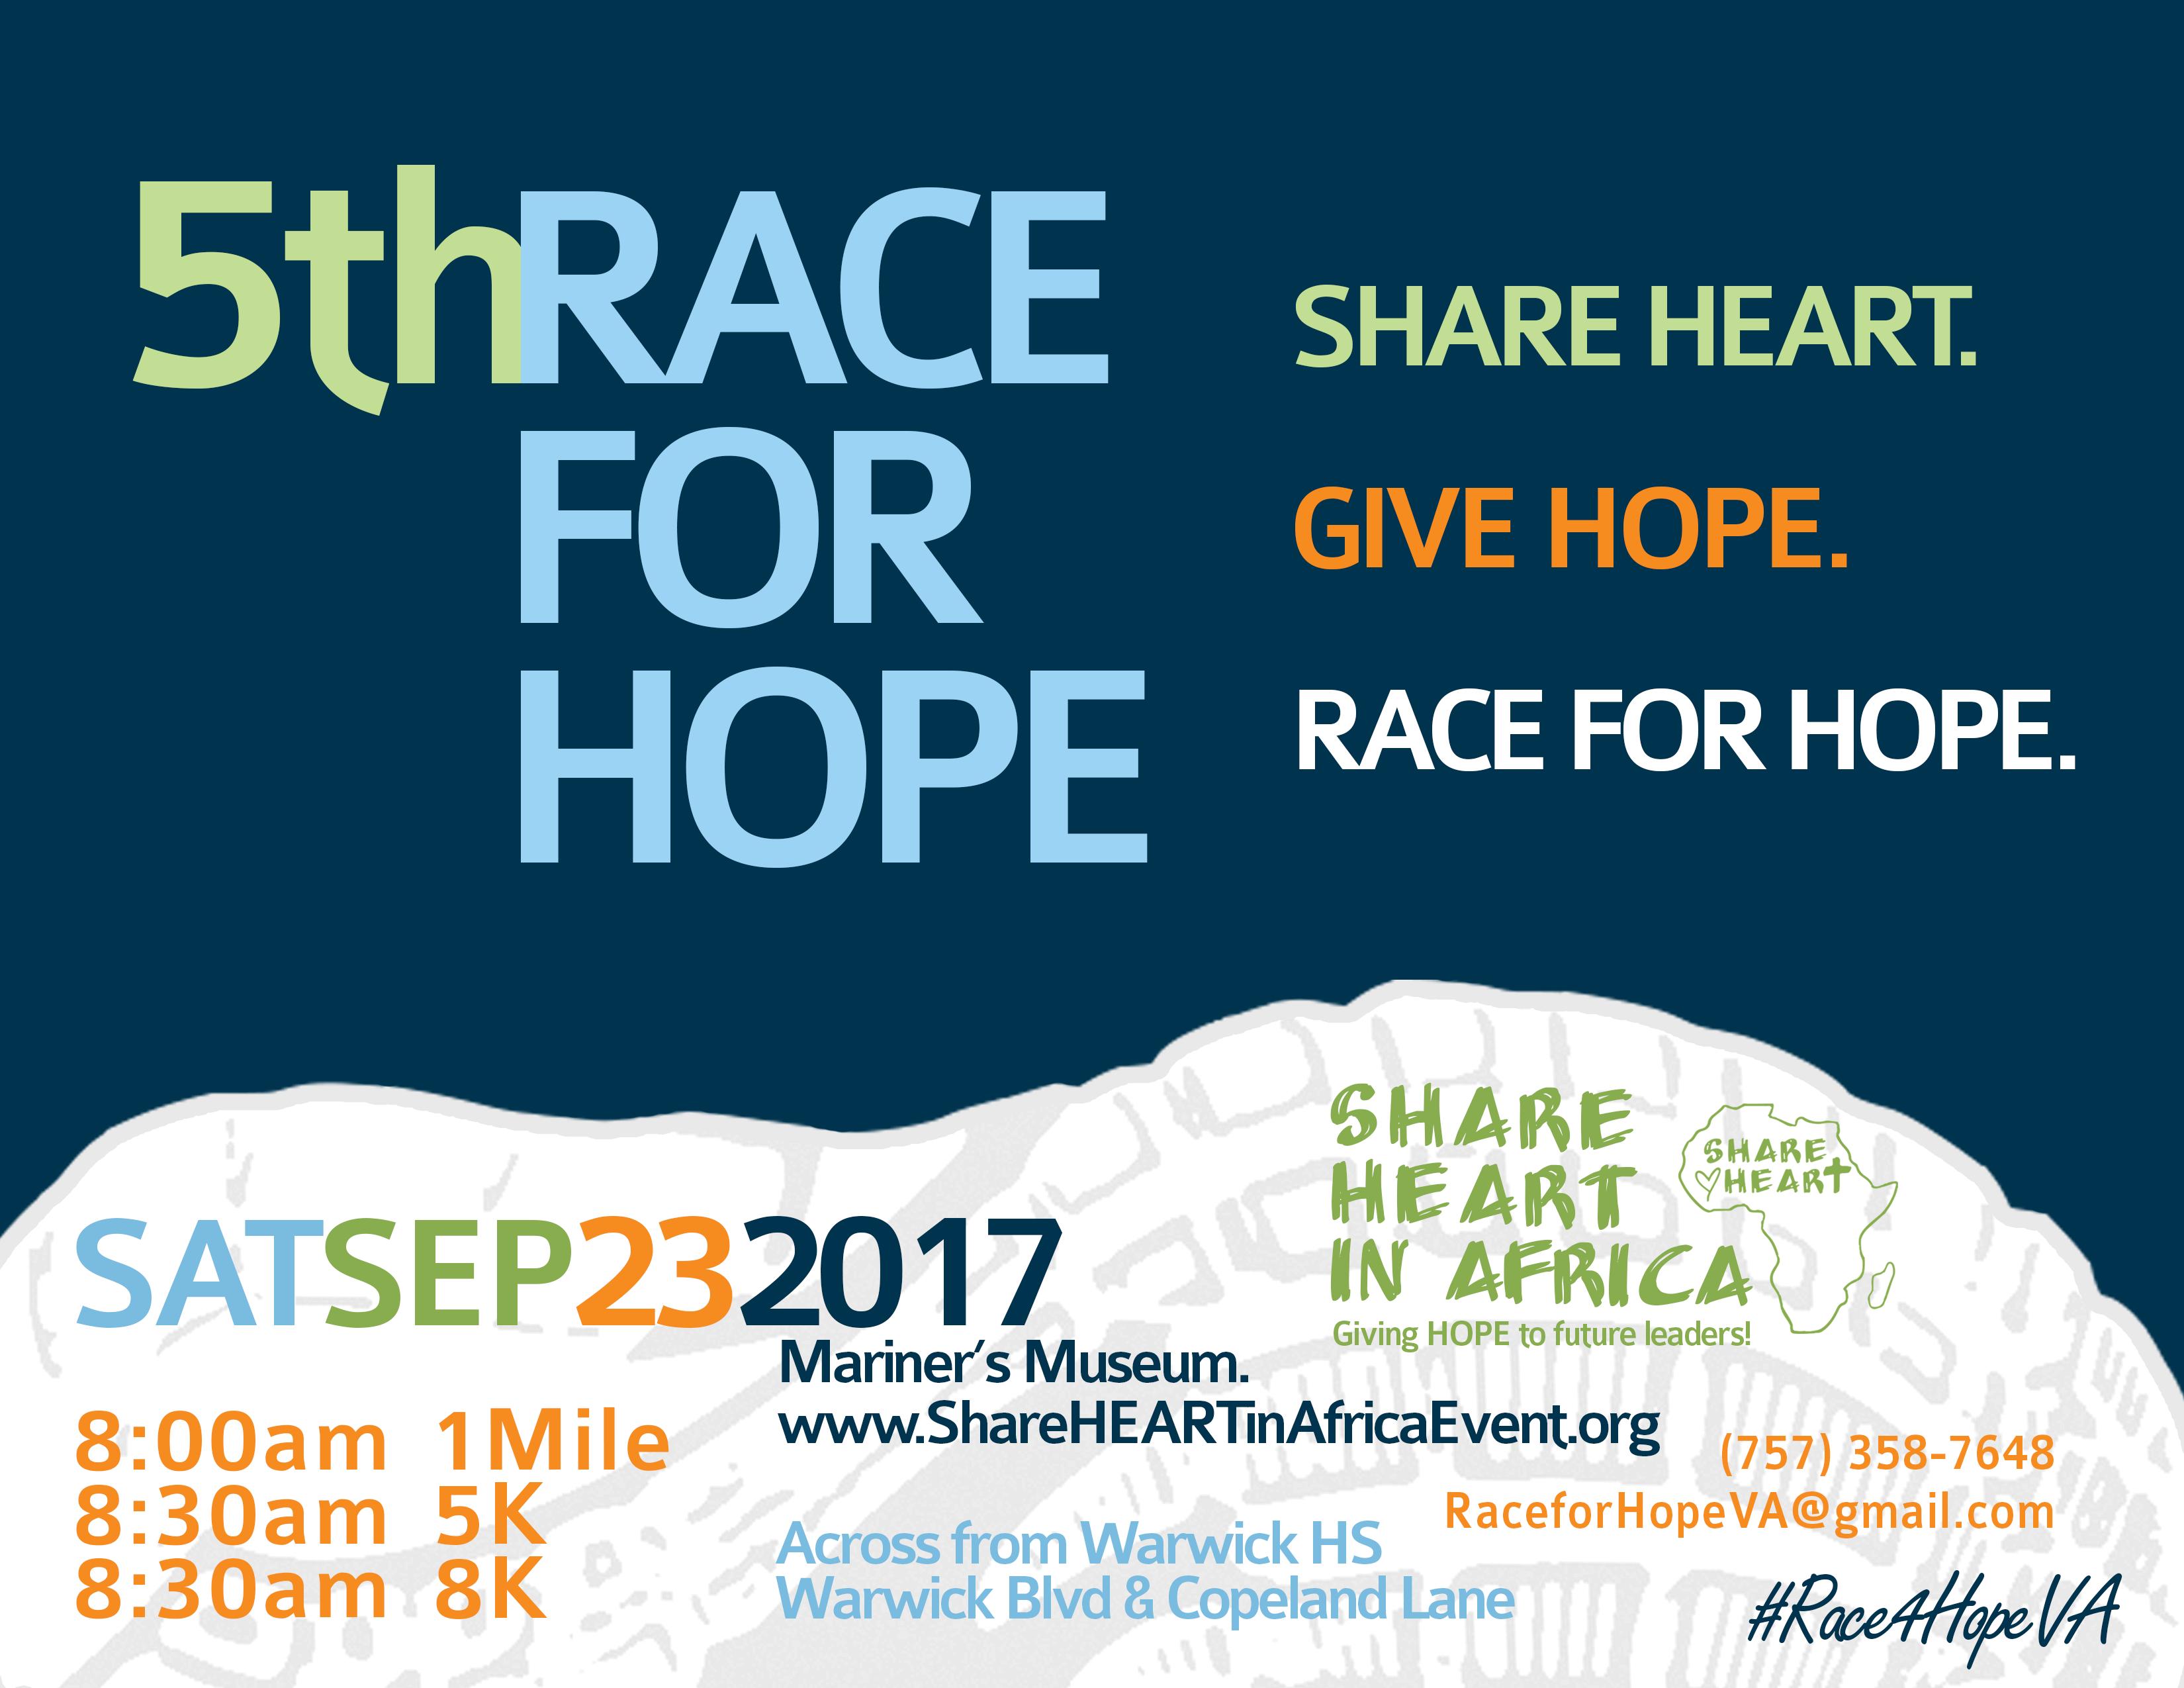 race-for-hope-8k-5k-1-mile-and-virtual-sponsor